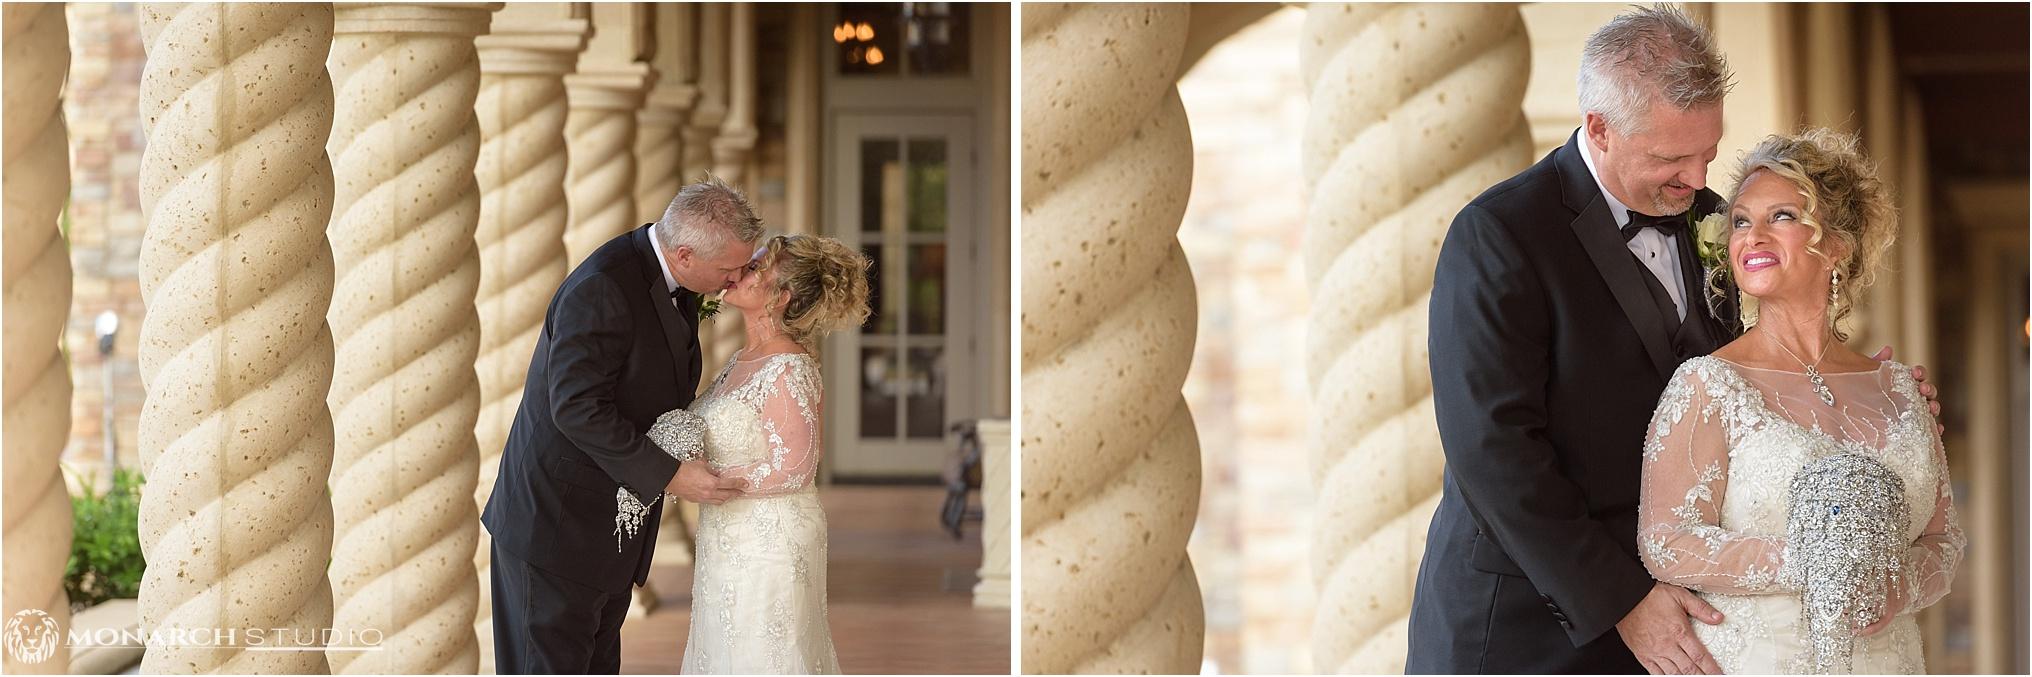 ponte-vedra-wedding-photographer-tpc024.jpg